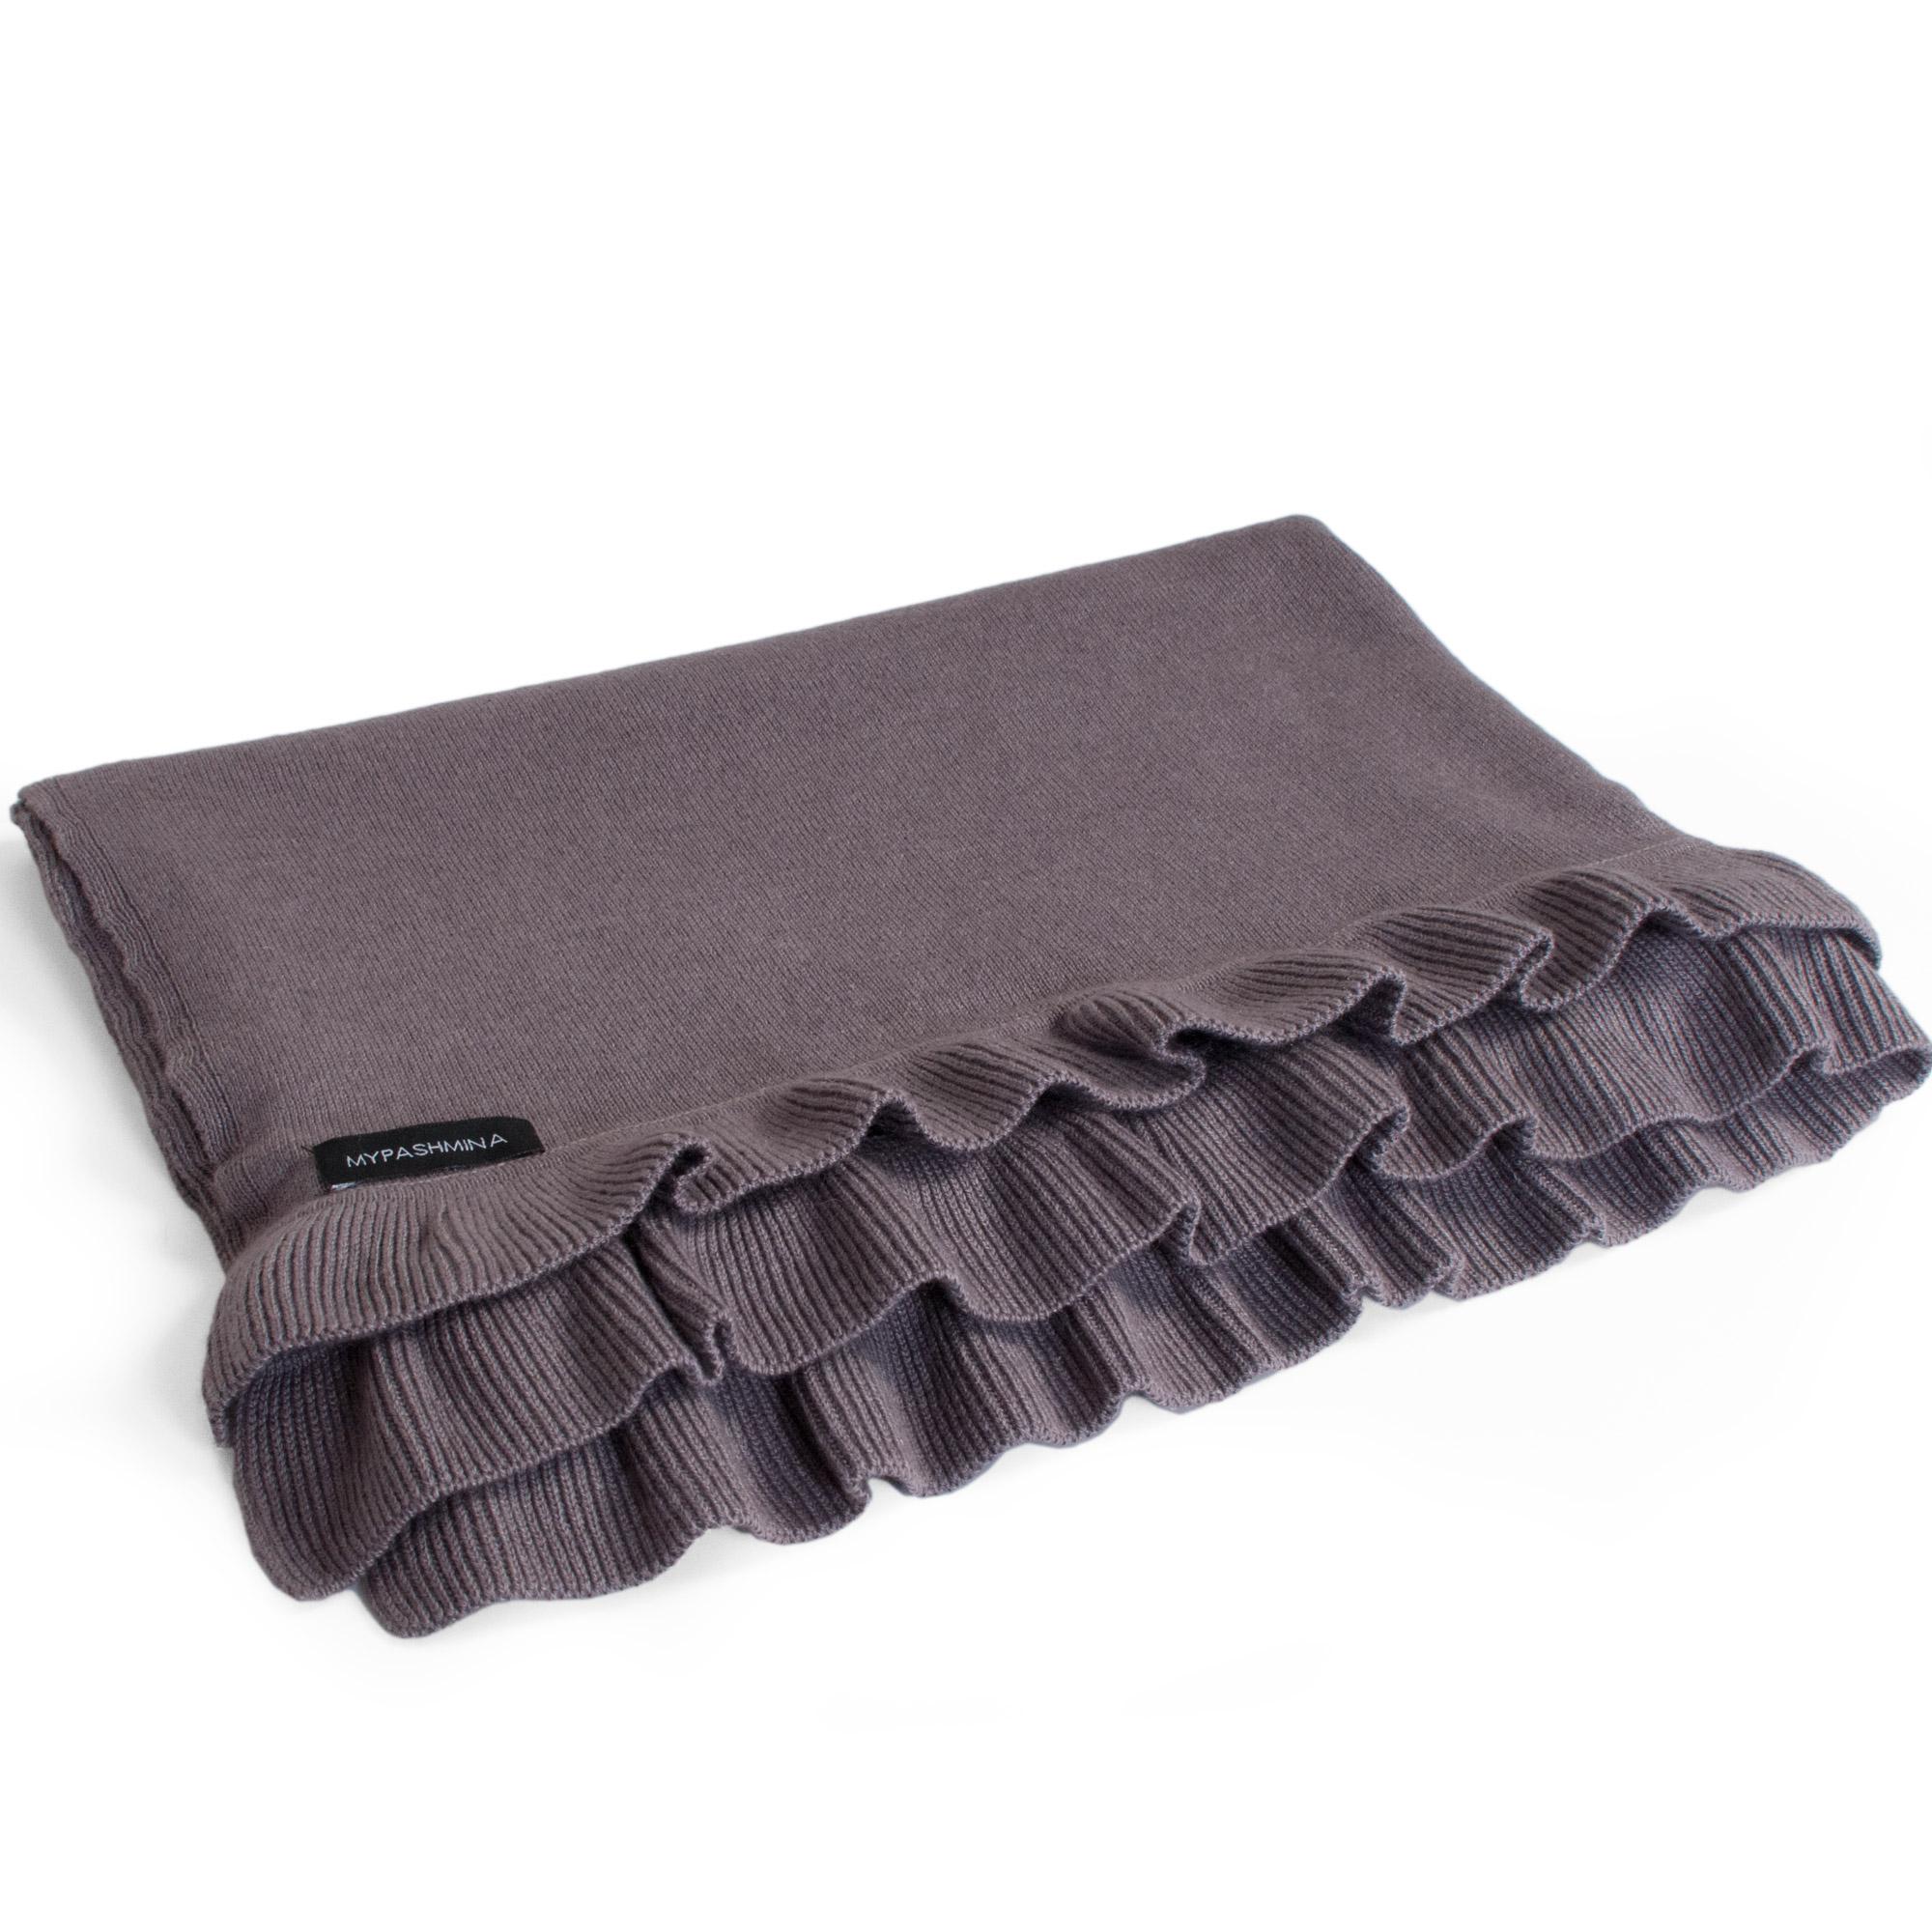 Frilled Edge Shawl - 50% Cashmere / 50% Silk - 70x200cm - Rabbit mp63